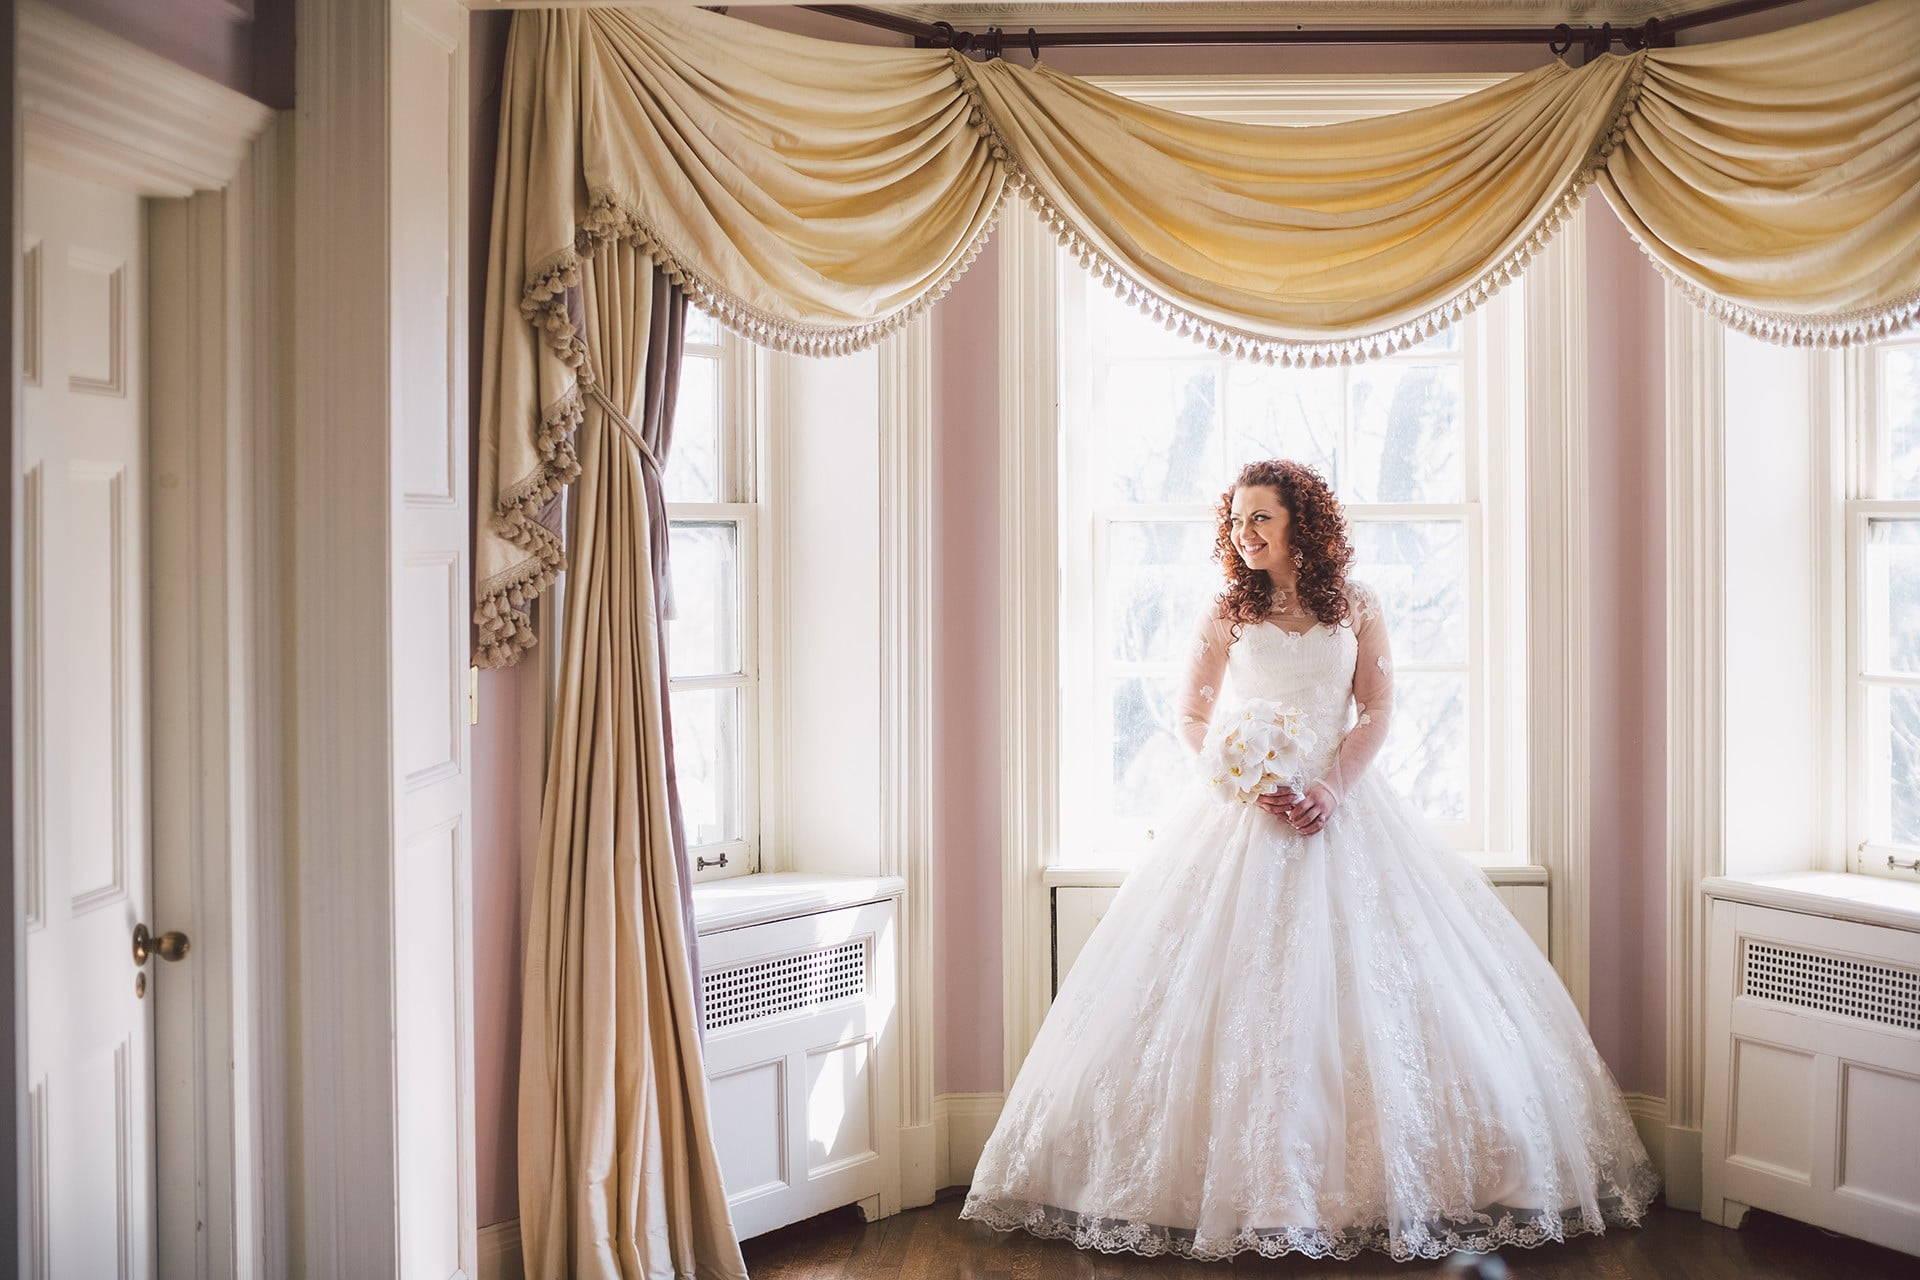 Hero image for Svetlana and Oleg's Wedding at Chateau Le Jardin Event Venue